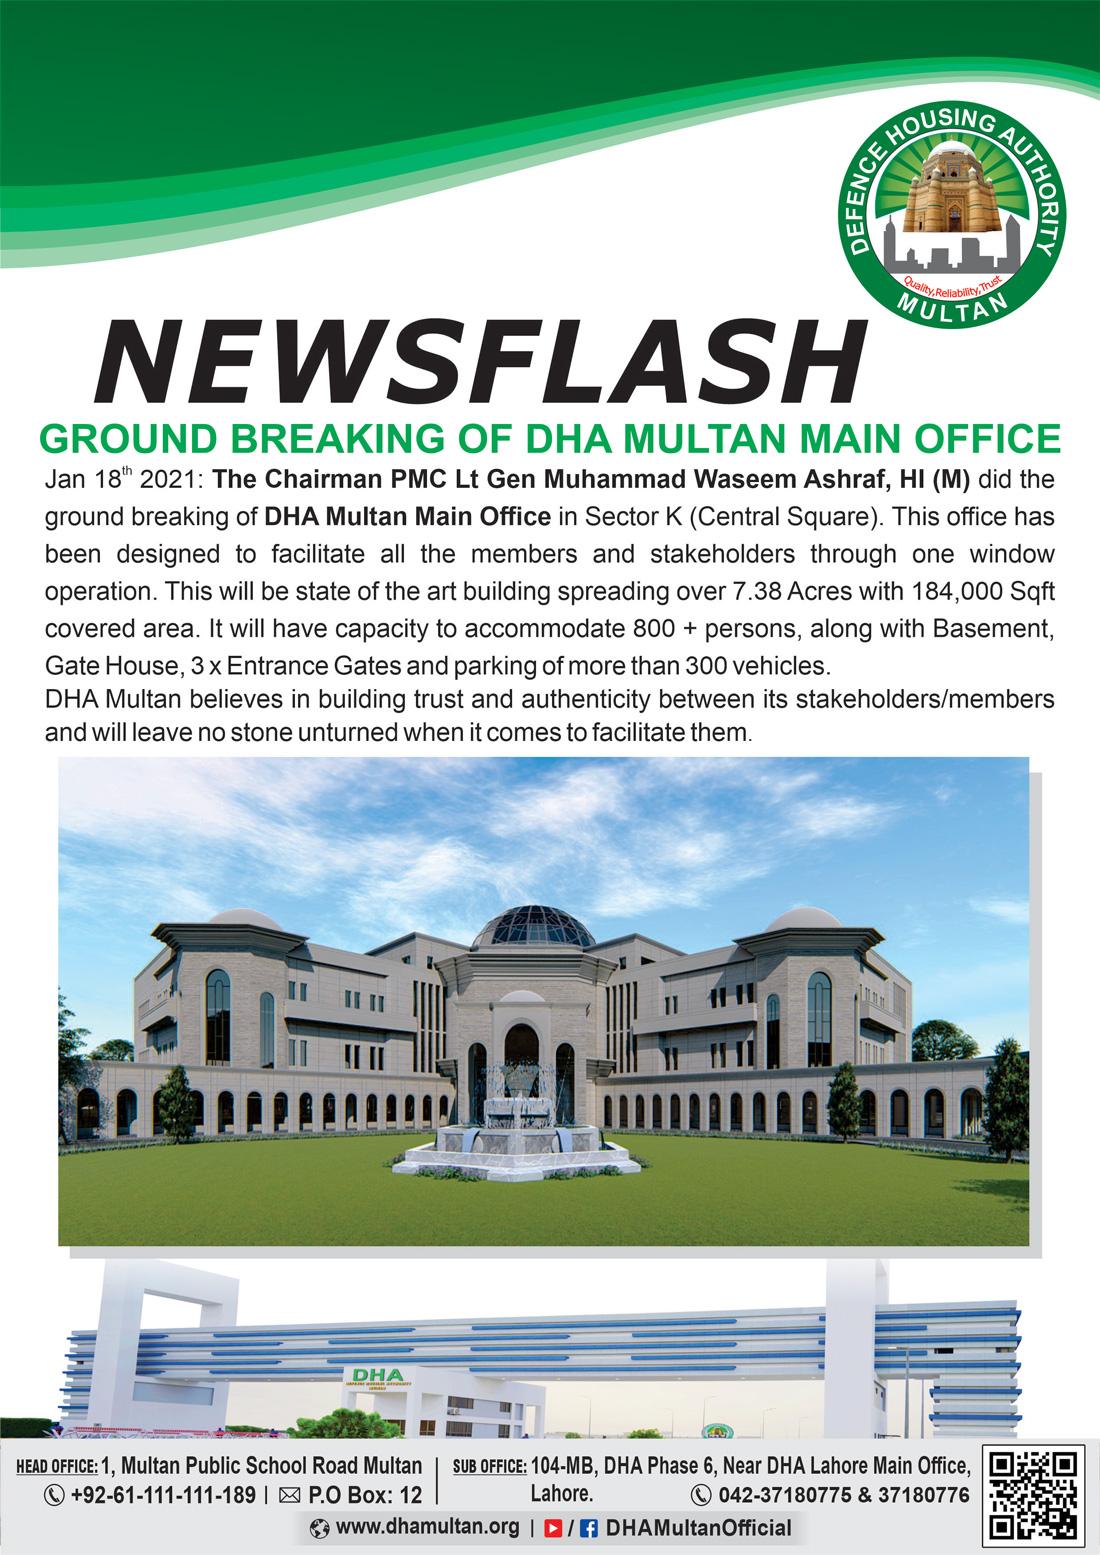 DHA Multan Ground Breaking of Main Office